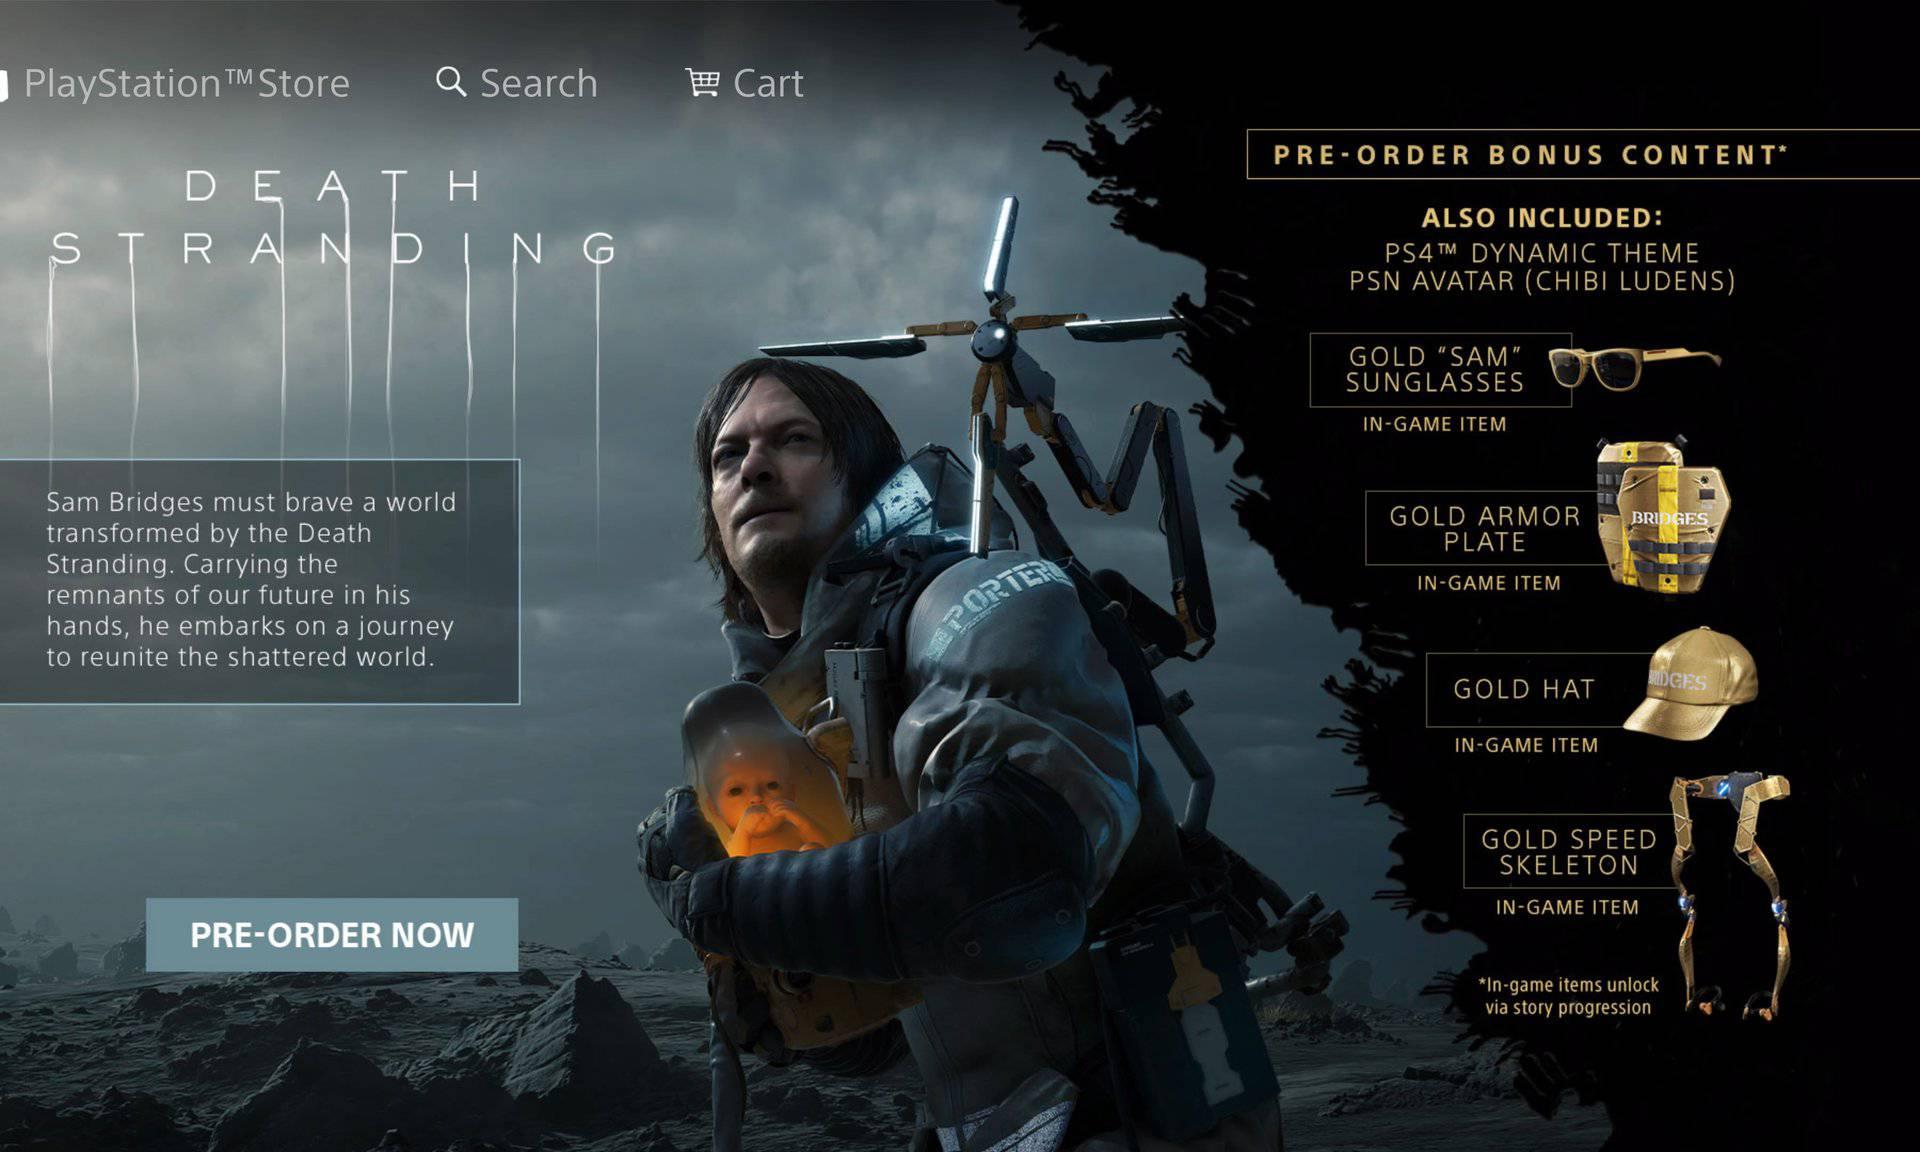 Sonyjev gaf otkrio nam je nove detalje o igri Death Stranding